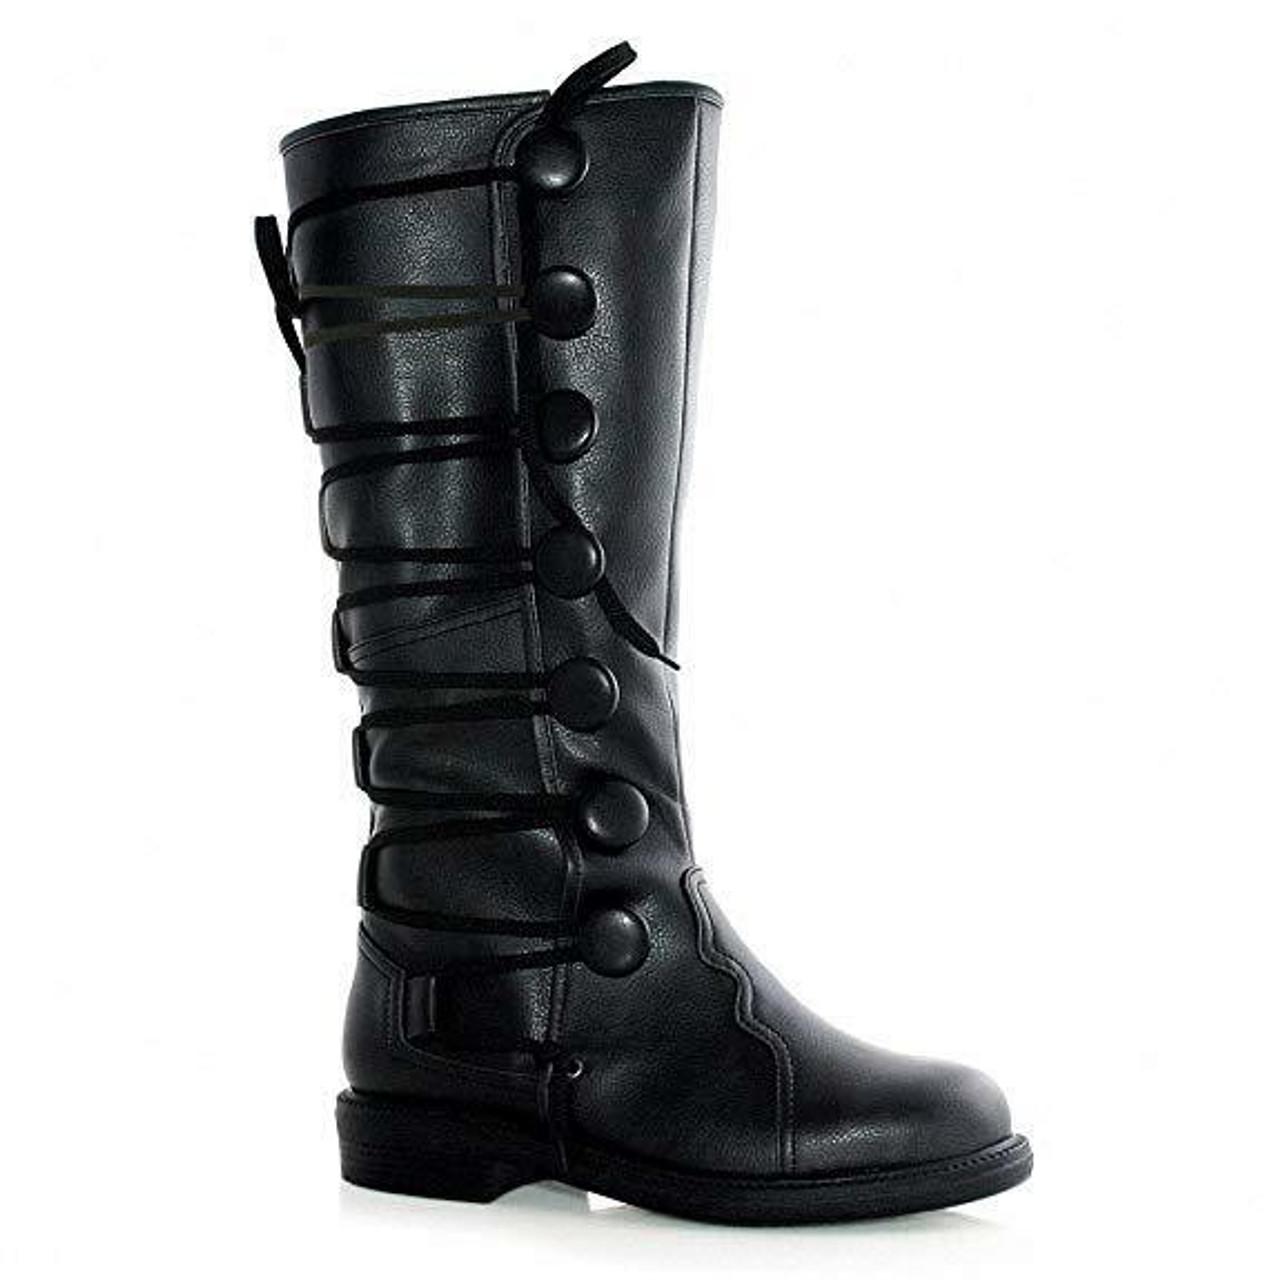 125-Matey 1 Inch Heel Men/'s Shoe by Ellie Shoes